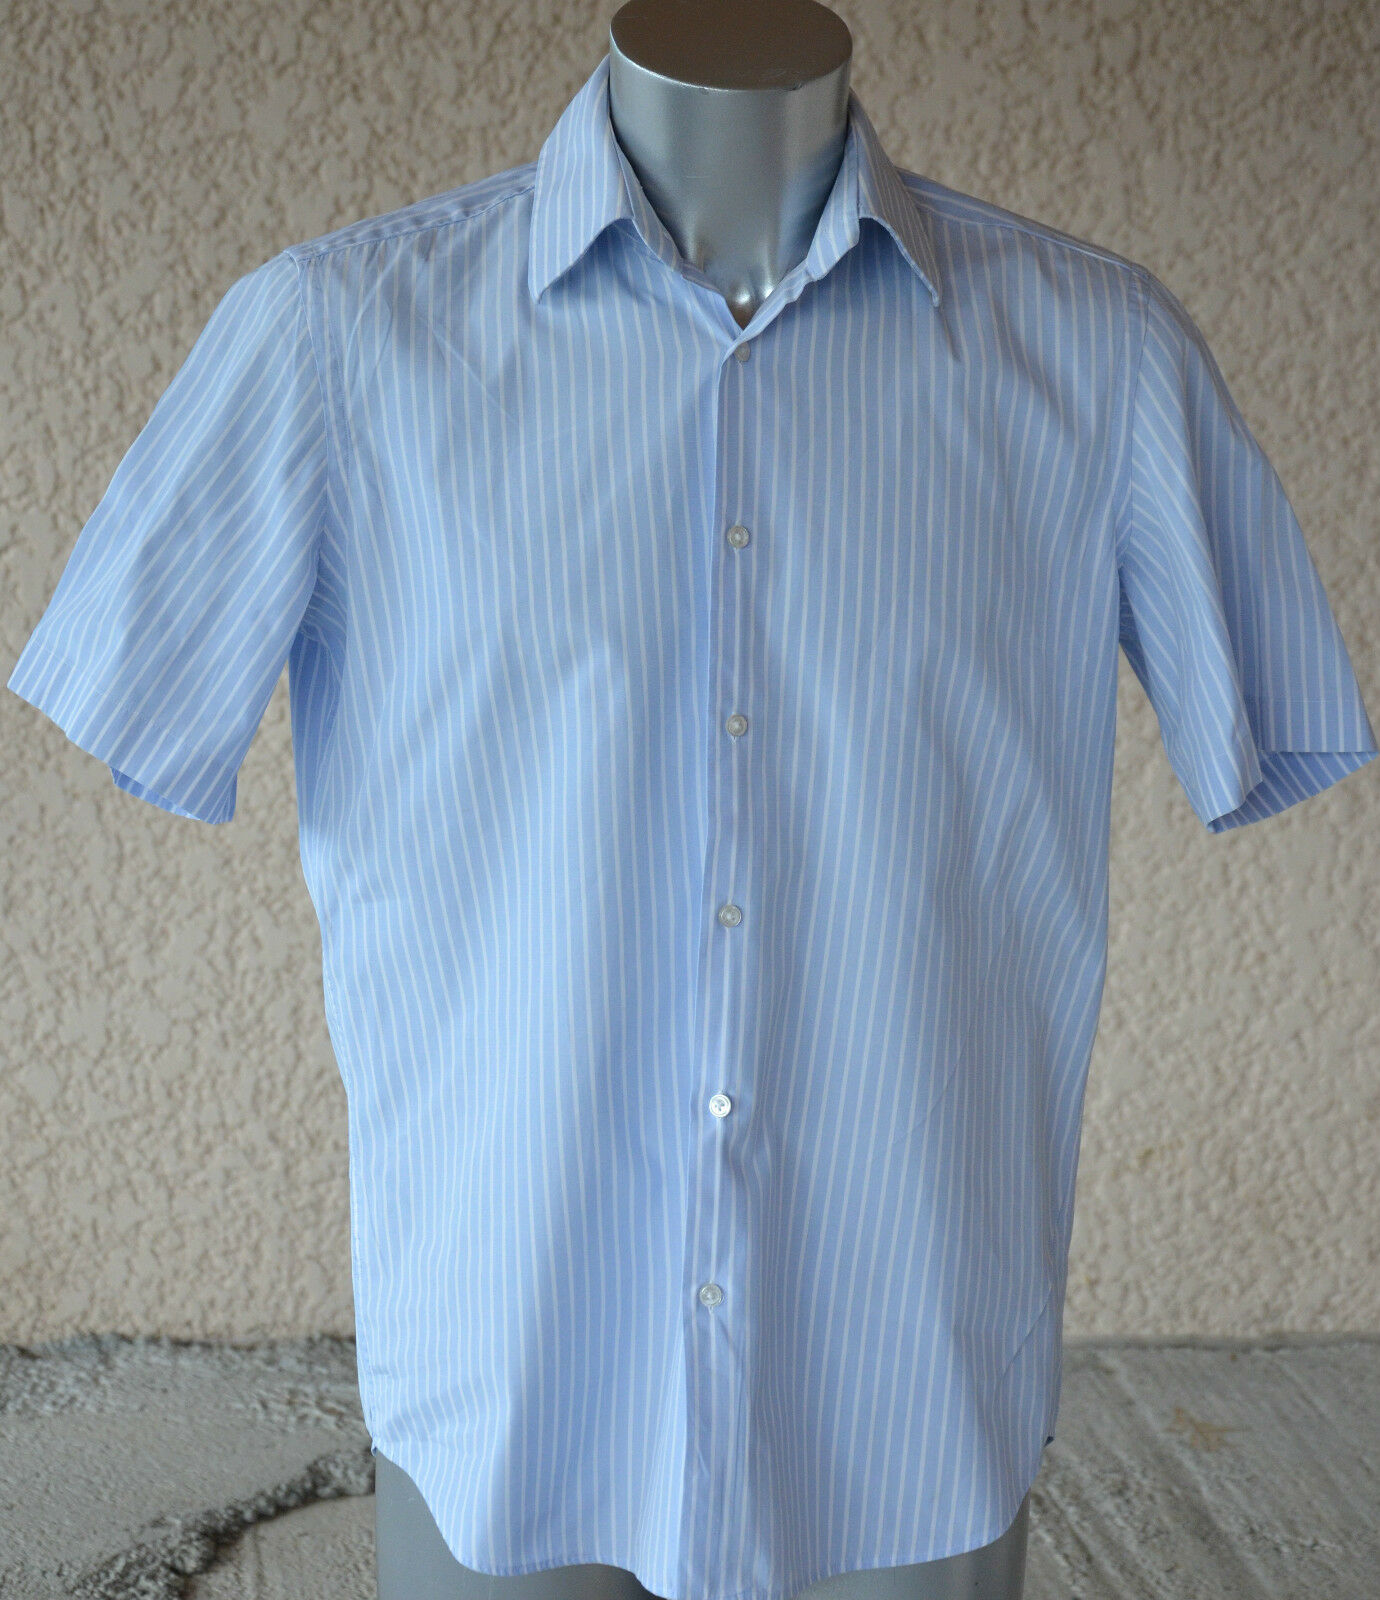 HUGO BOSS - Adorable shirt bluee sleeves short-size 39 - MINT